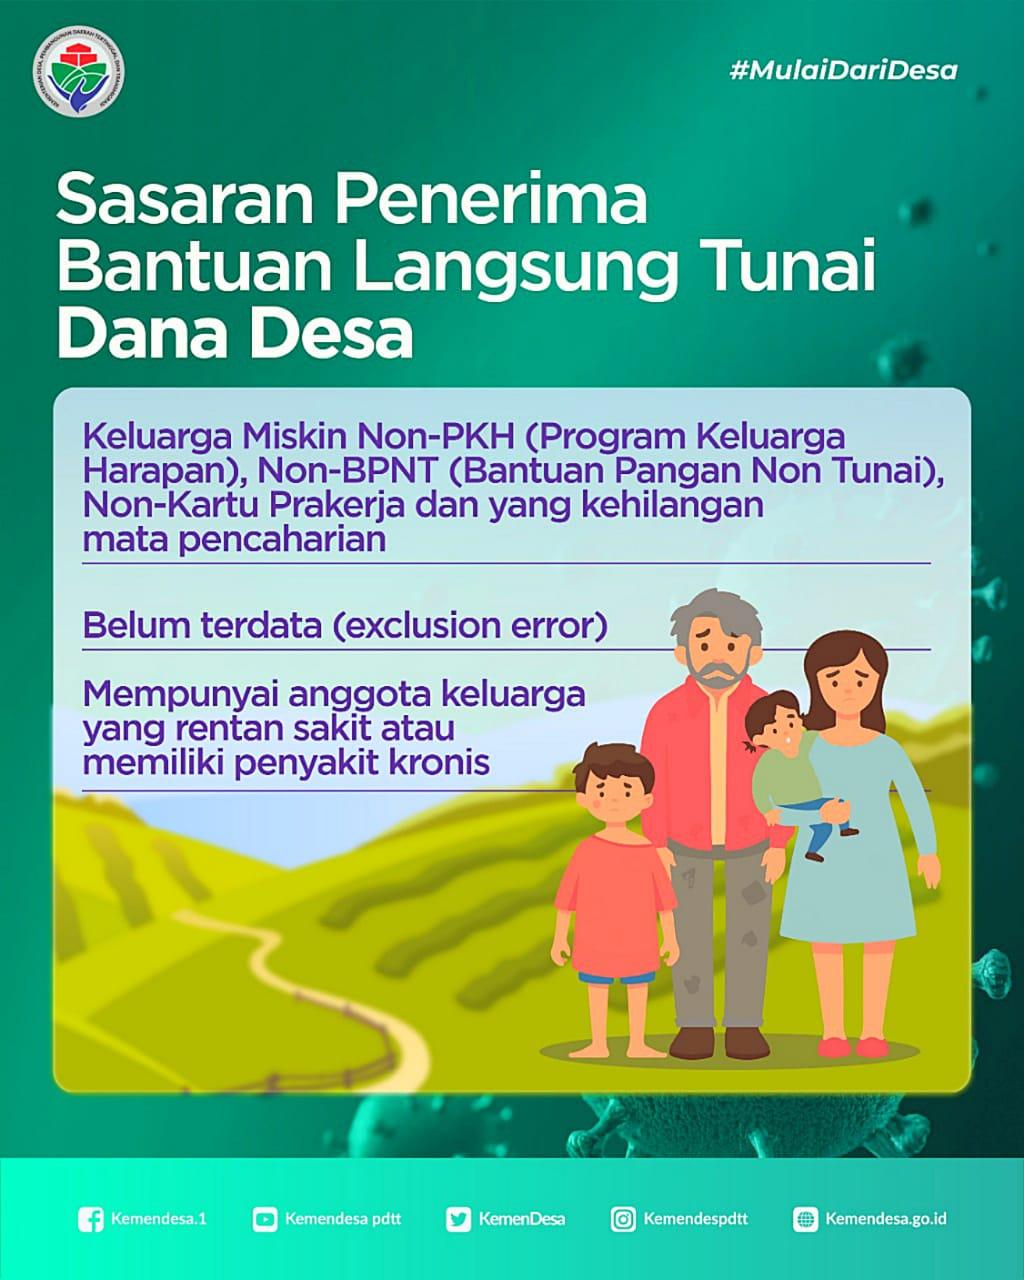 Bantuan Langsung Tunai BLT Dana Desa Sasaran Penerima Perhitungan dan Besaran - infokowasi